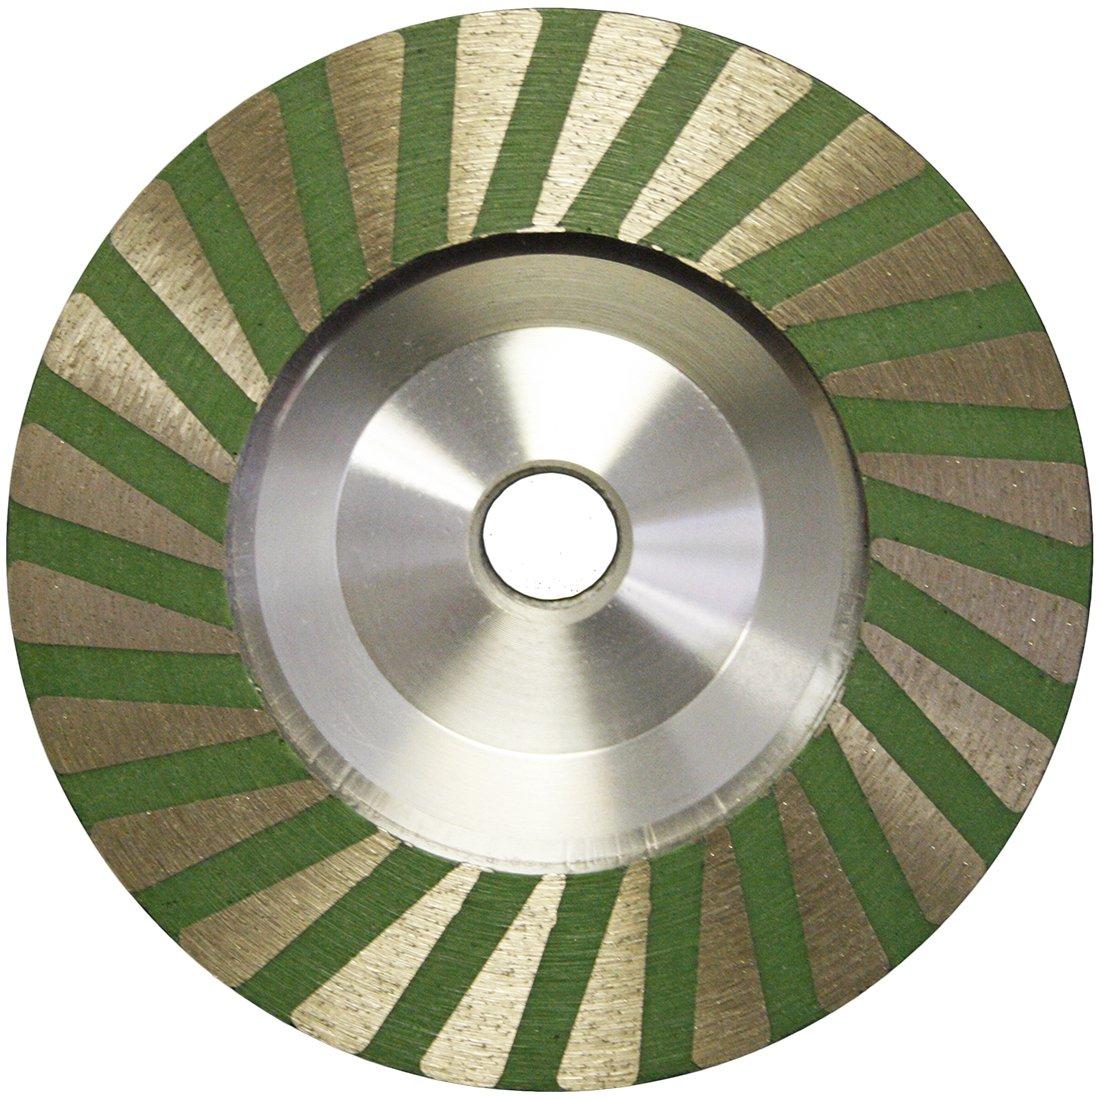 4'' Slayer Resin filled Turbo Cup Wheel Alum Backer - Fine by Slayer